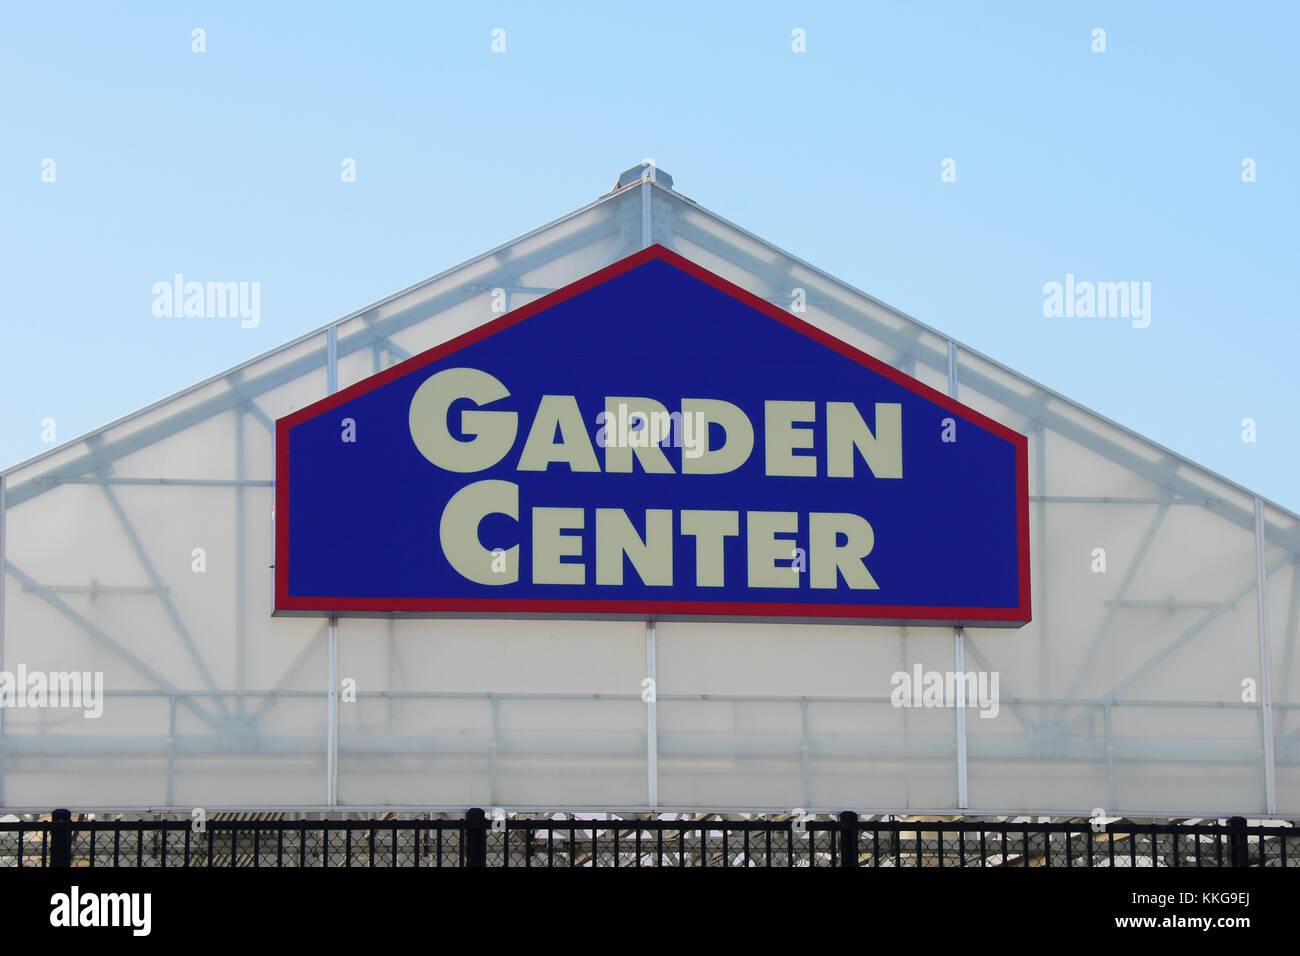 Garden Center Sign On The Canopy At Loweu0027s Home Center Garden Building.    Stock Image